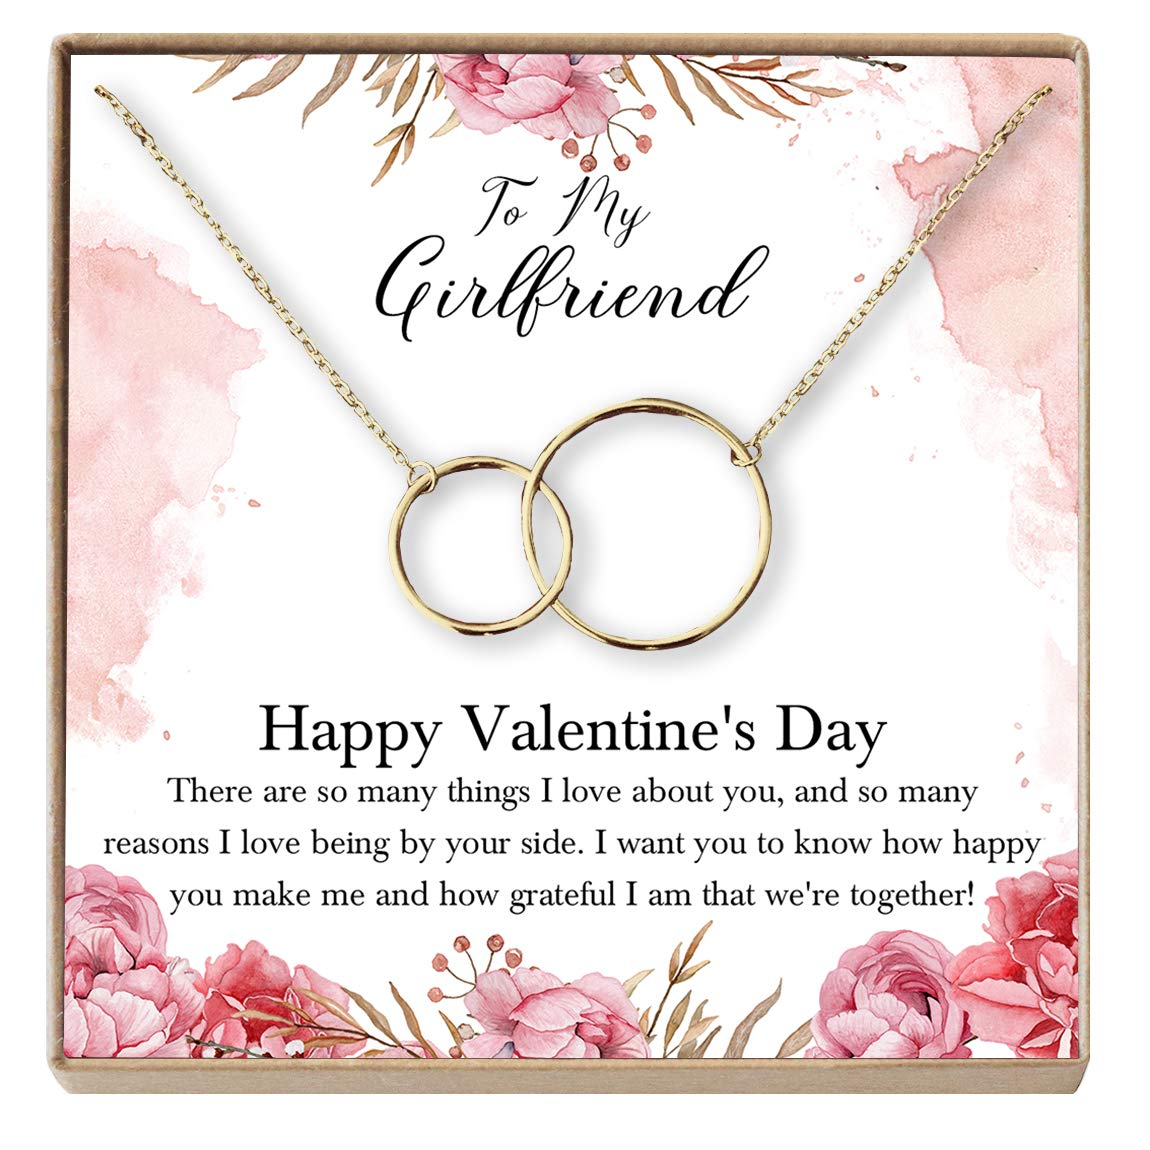 2 Interlocking Circles Anniversary Dear Ava for Girlfriend Necklace Valentines Day